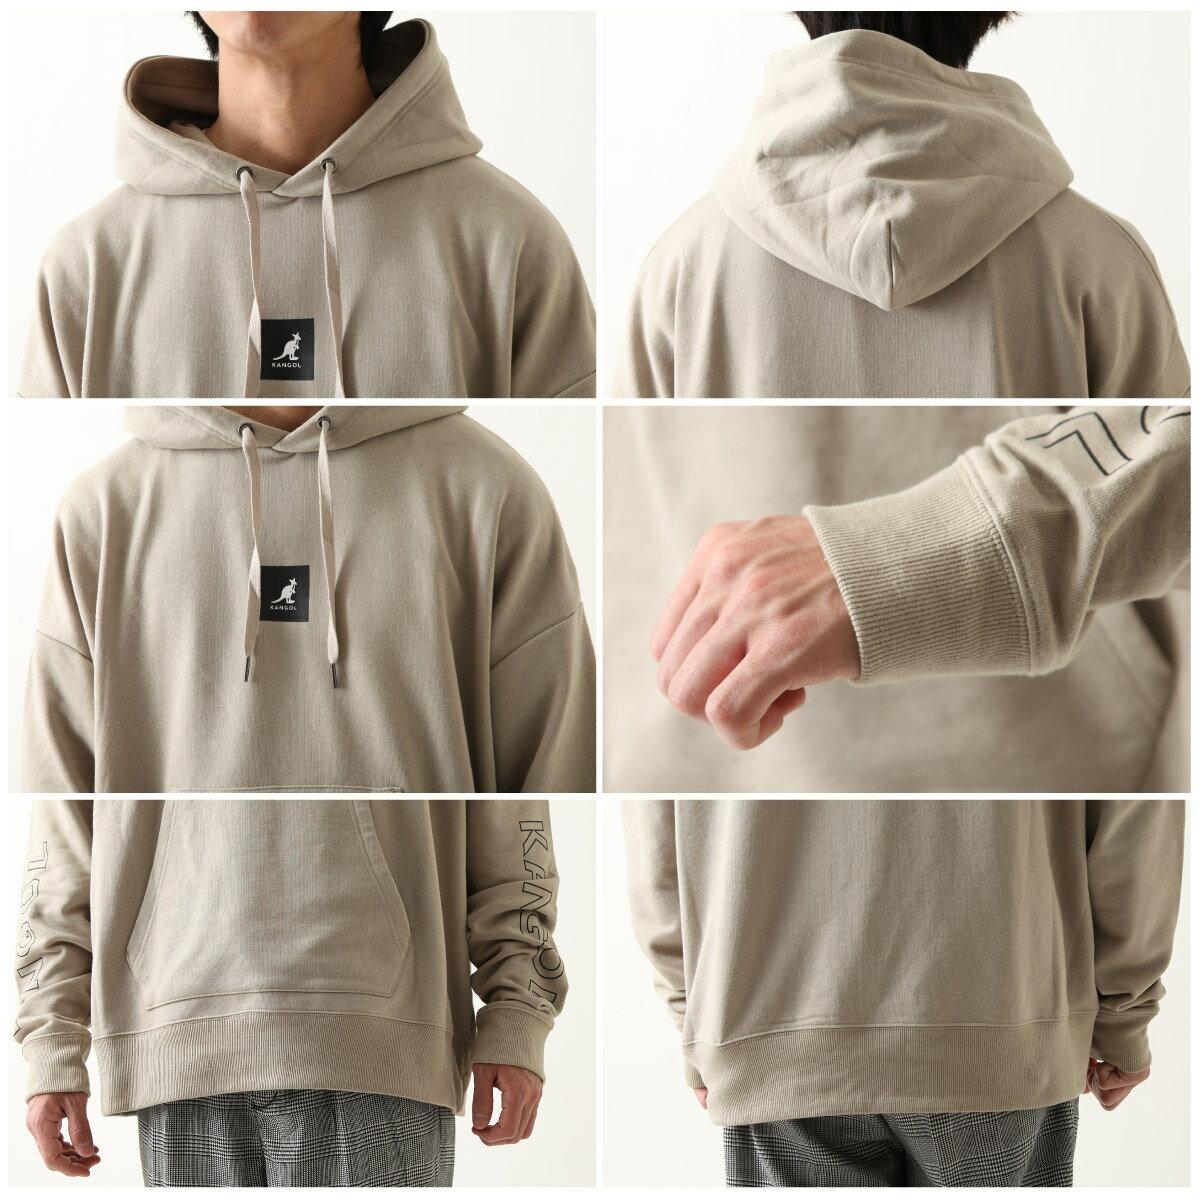 【New】KANGOL LOGO設計連帽衫 【L-XL】 7